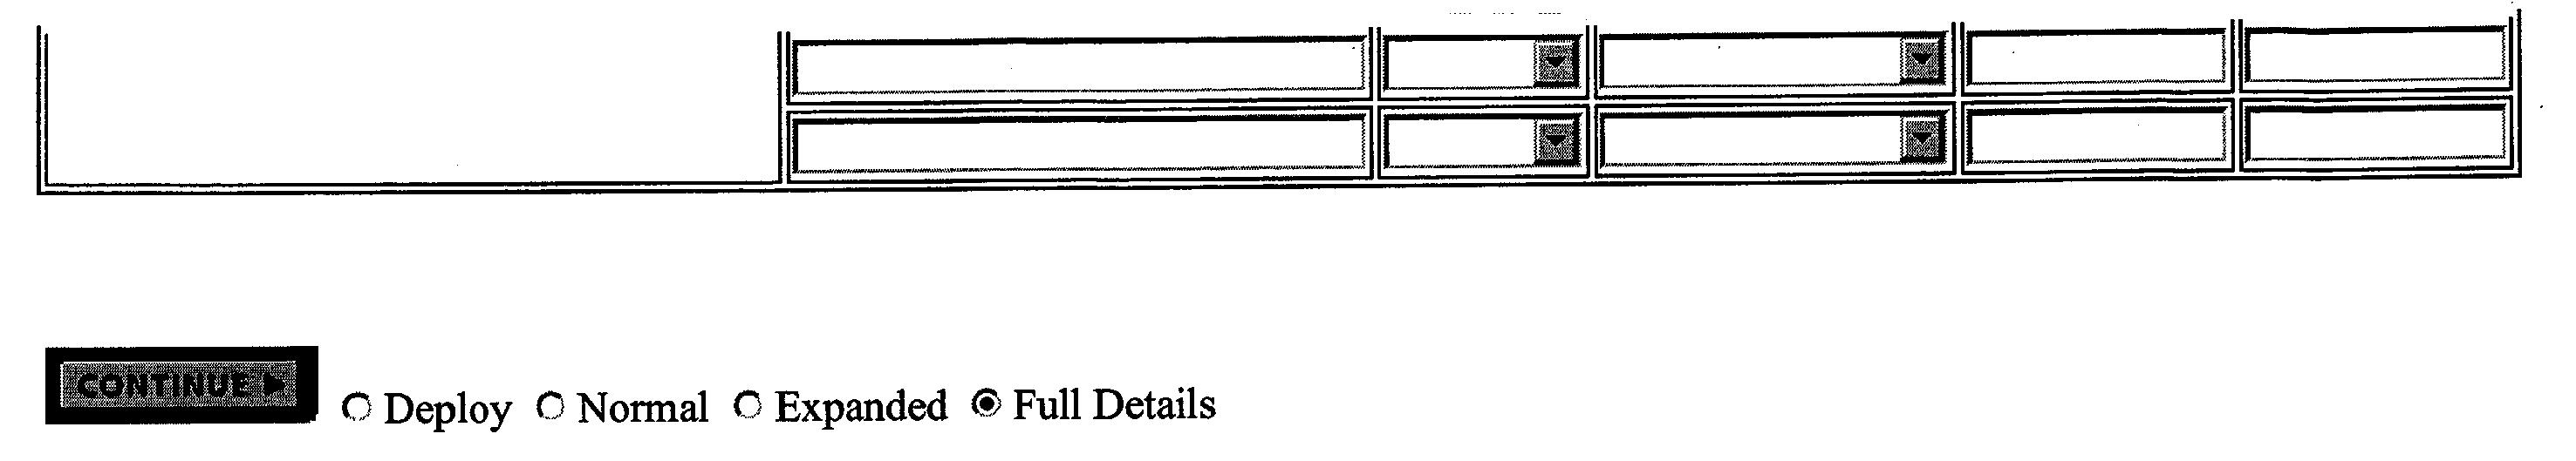 Figure US20020035486A1-20020321-P00194